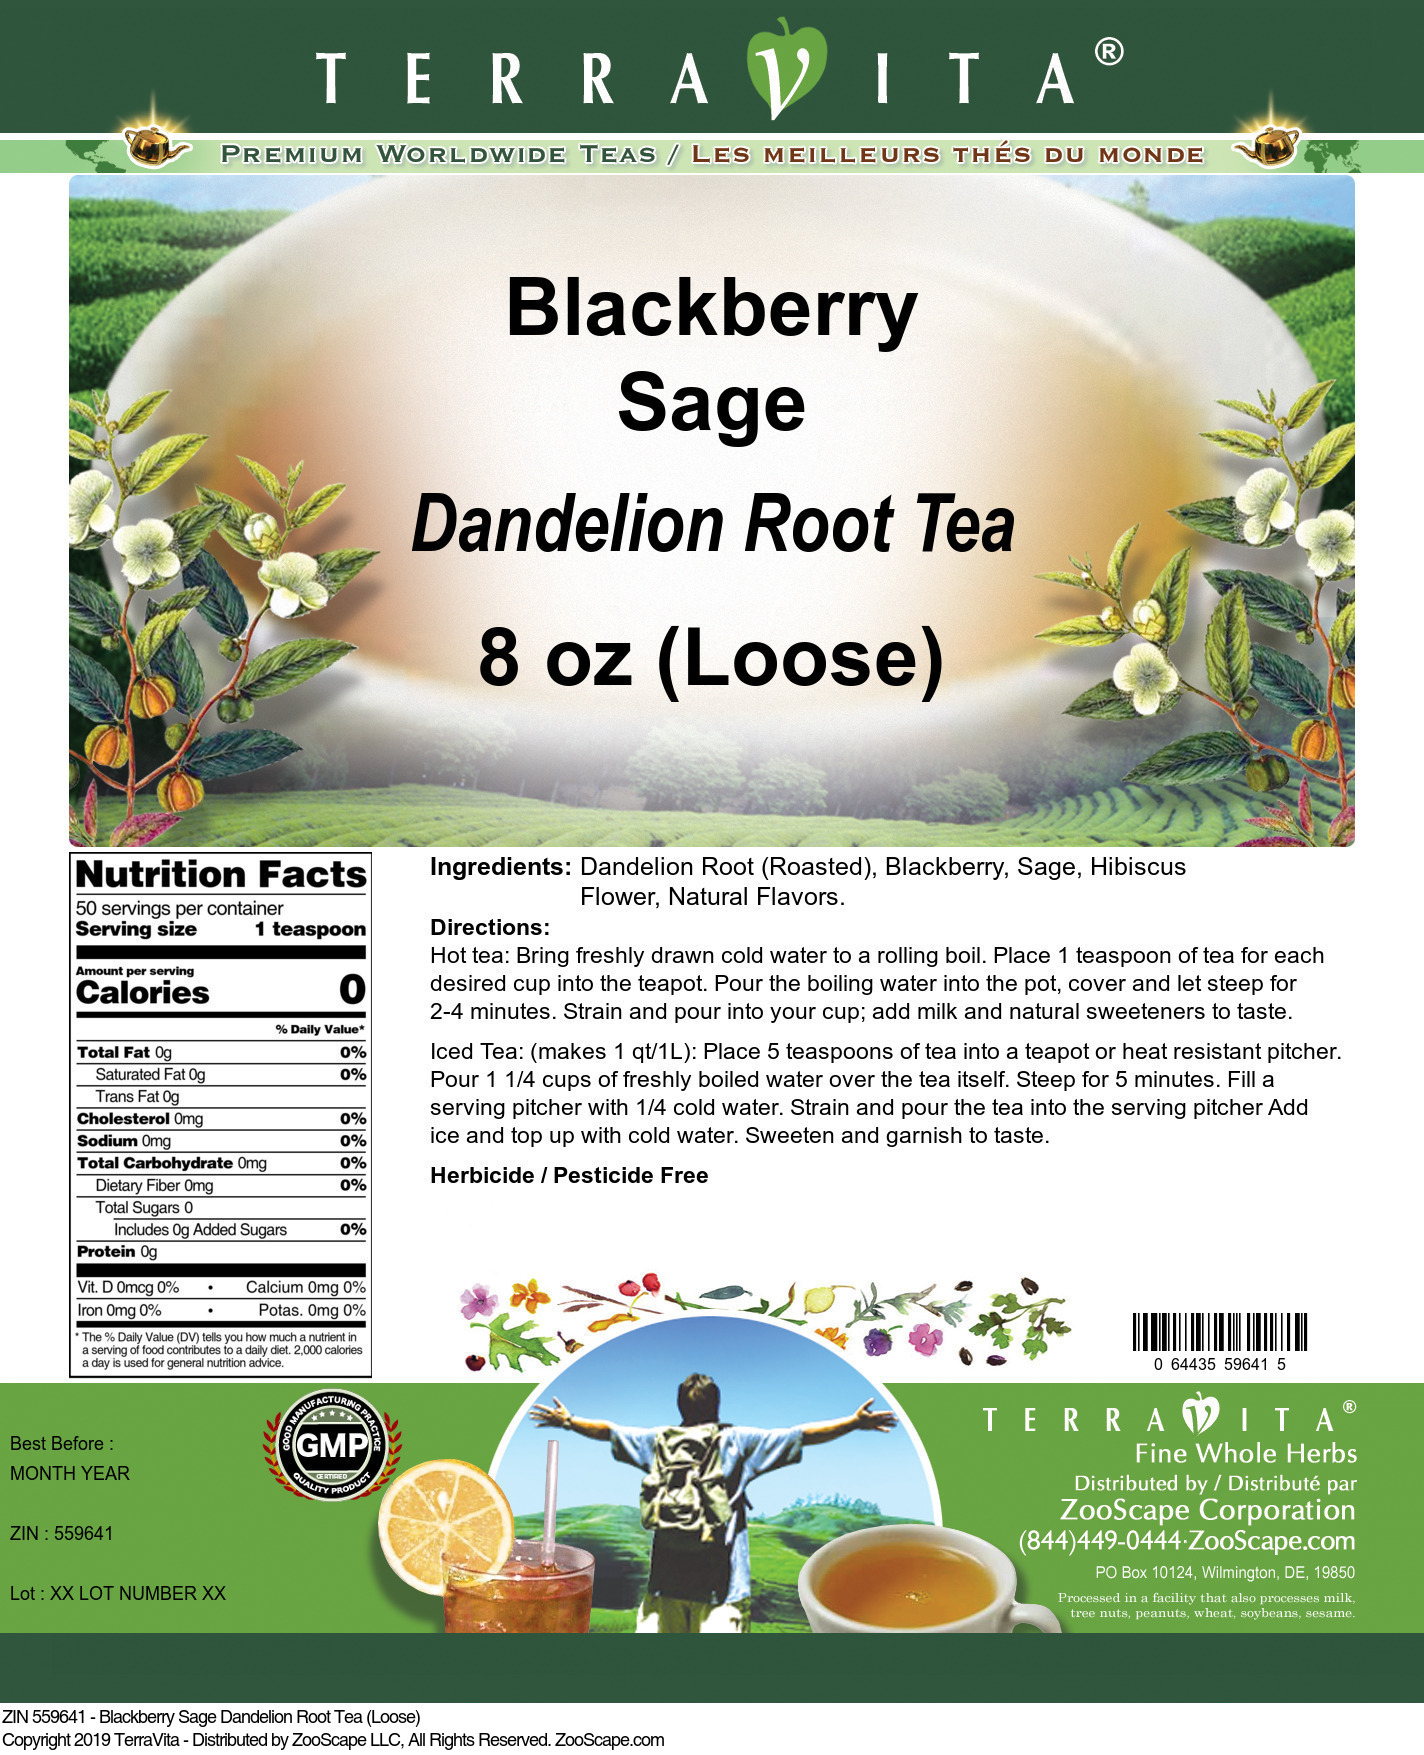 Blackberry Sage Dandelion Root Tea (Loose)